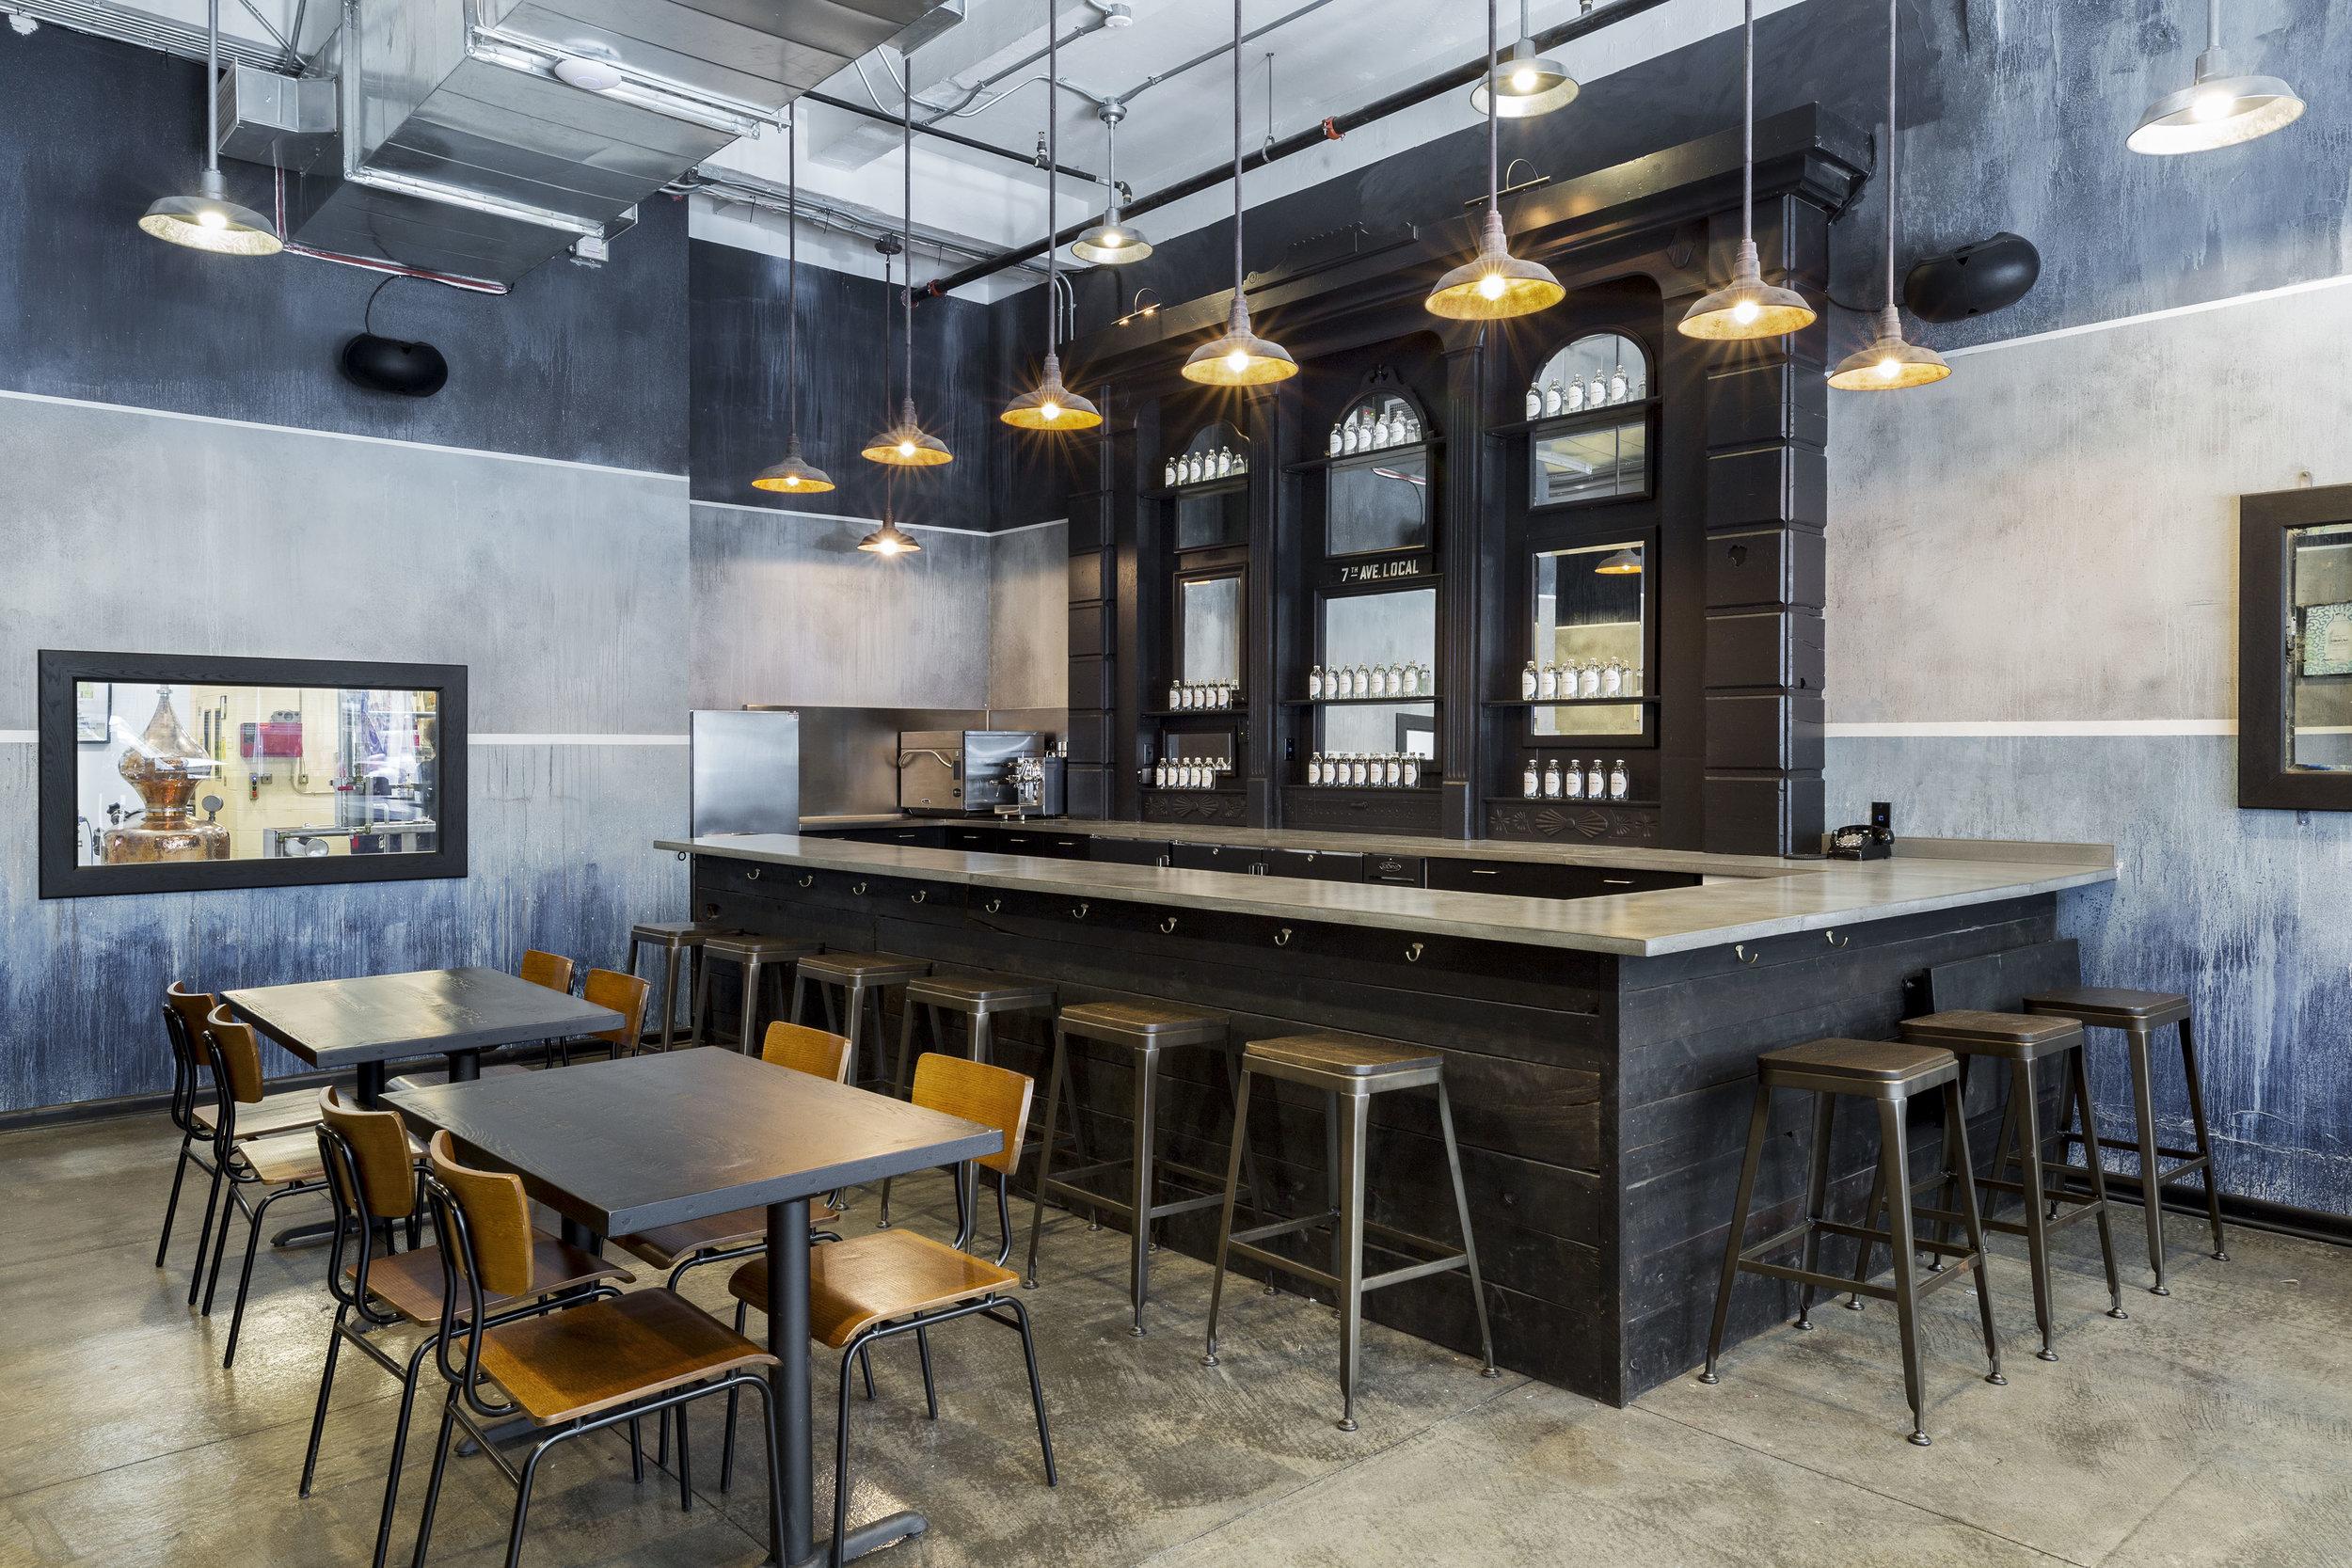 press-distillery-bar-OurVodkaNYC-0240.jpg